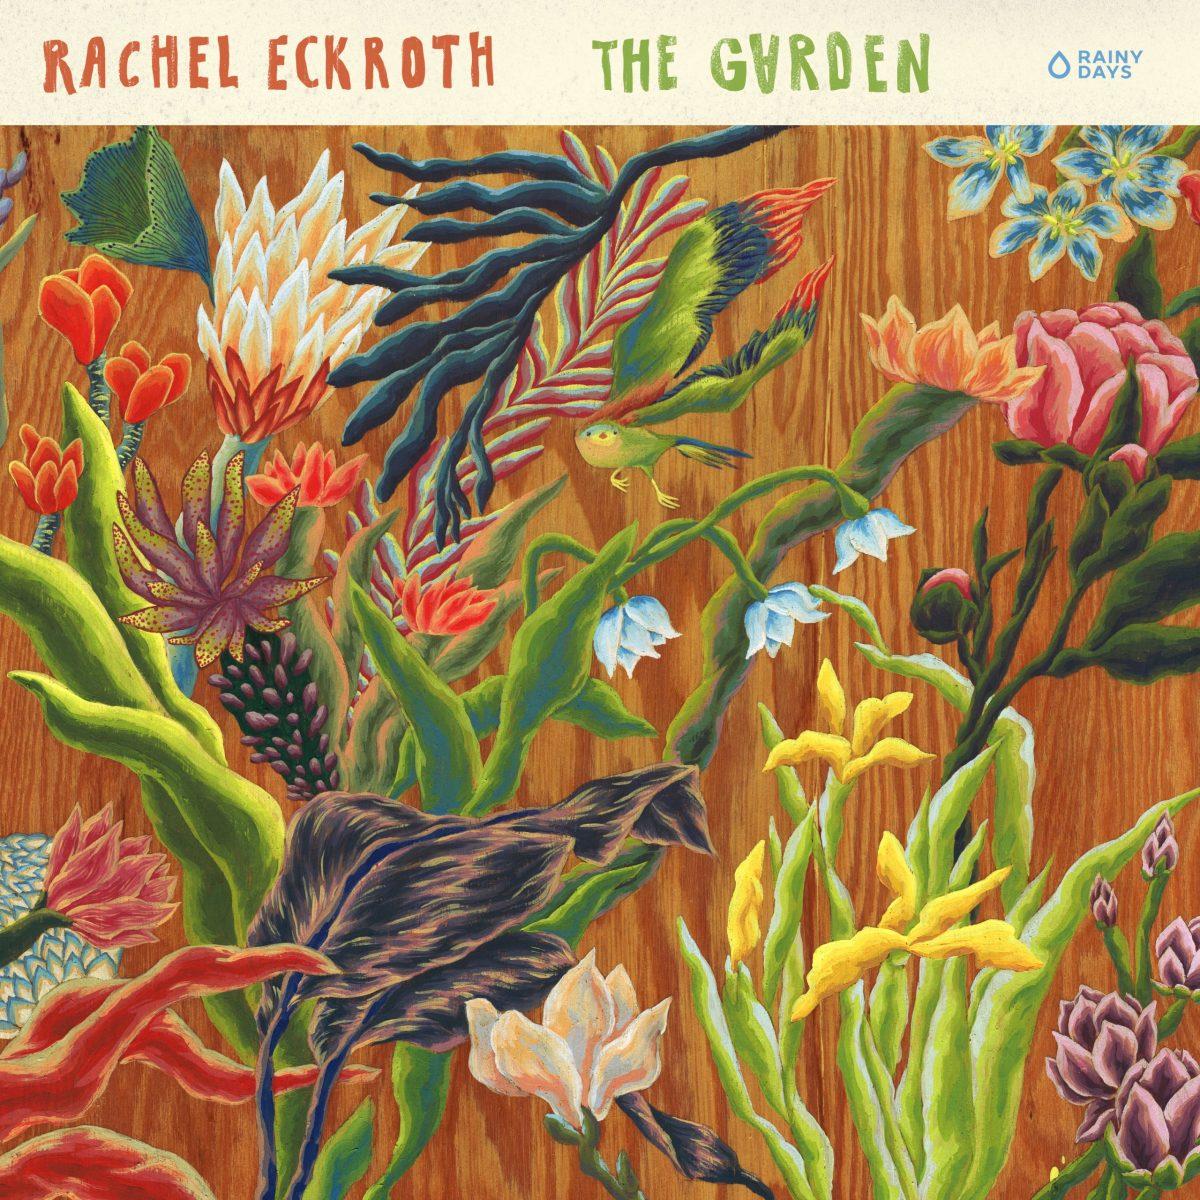 Rachel-Eckroth-The-Garden-1-scaled